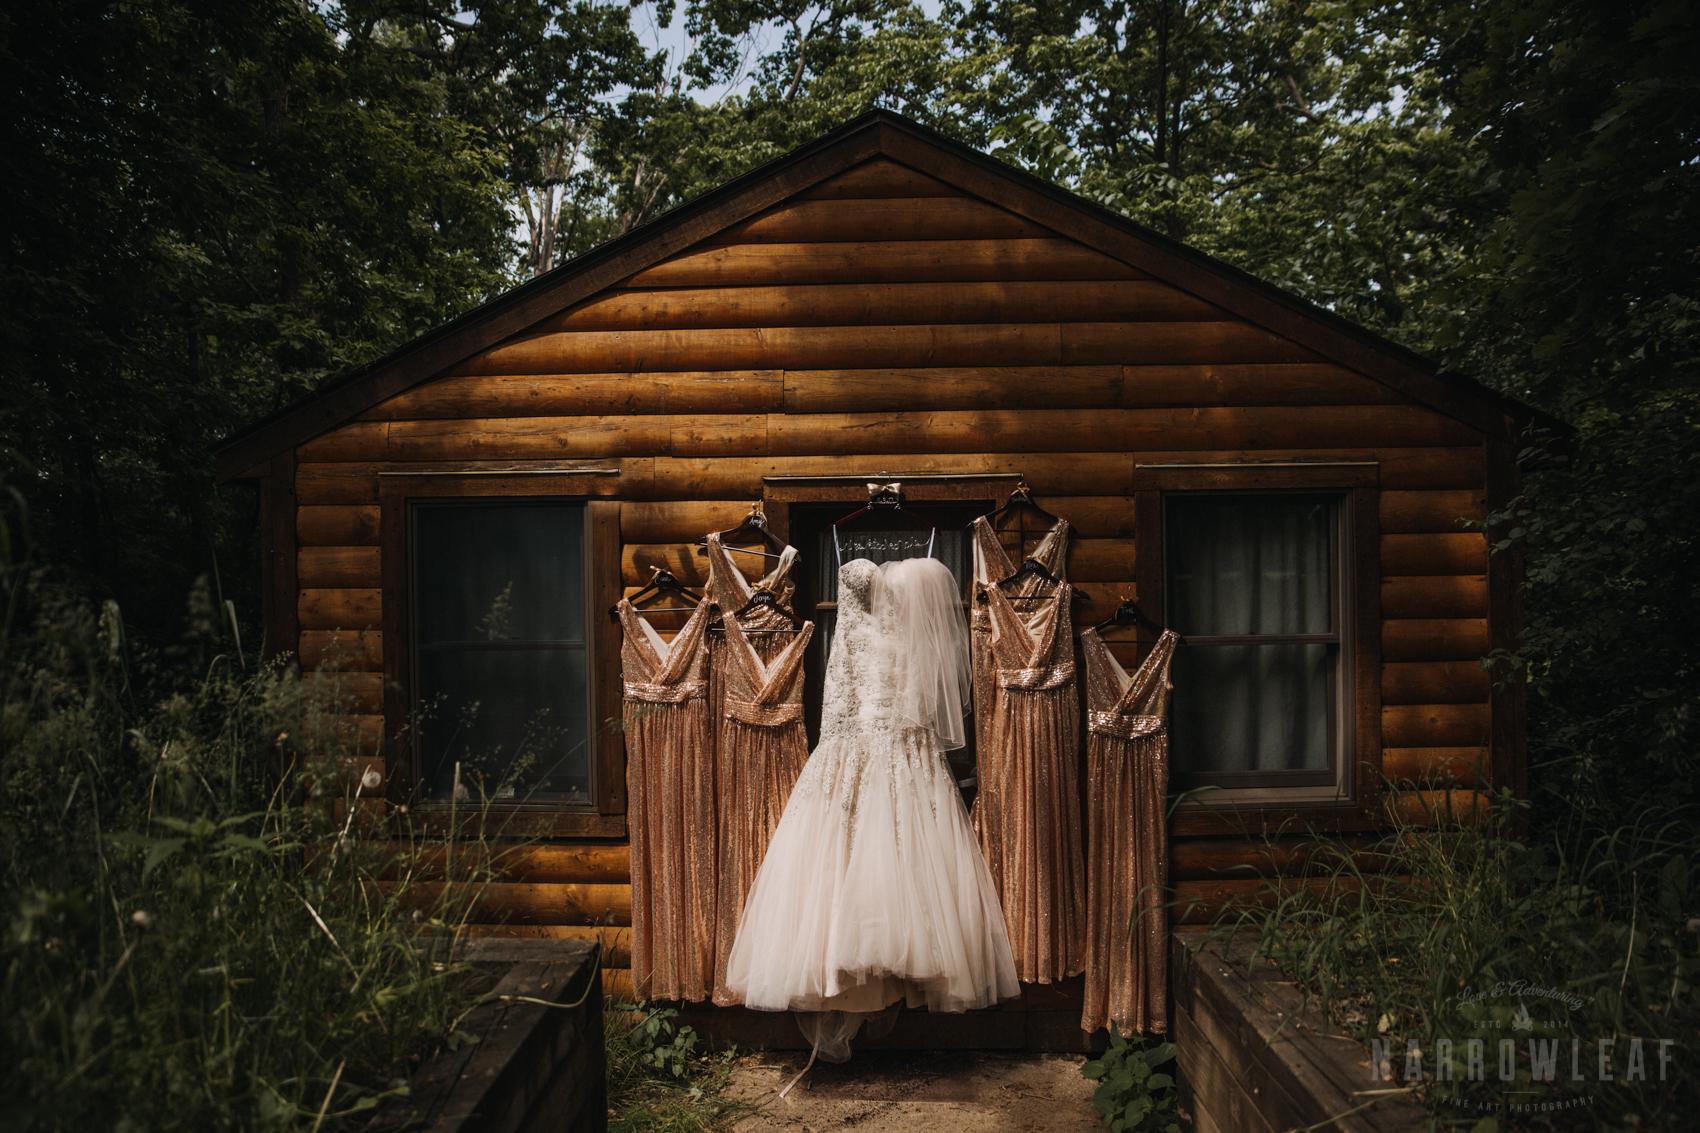 Camp-wooded-wedding-style-hudson-wi-details-300.jpg